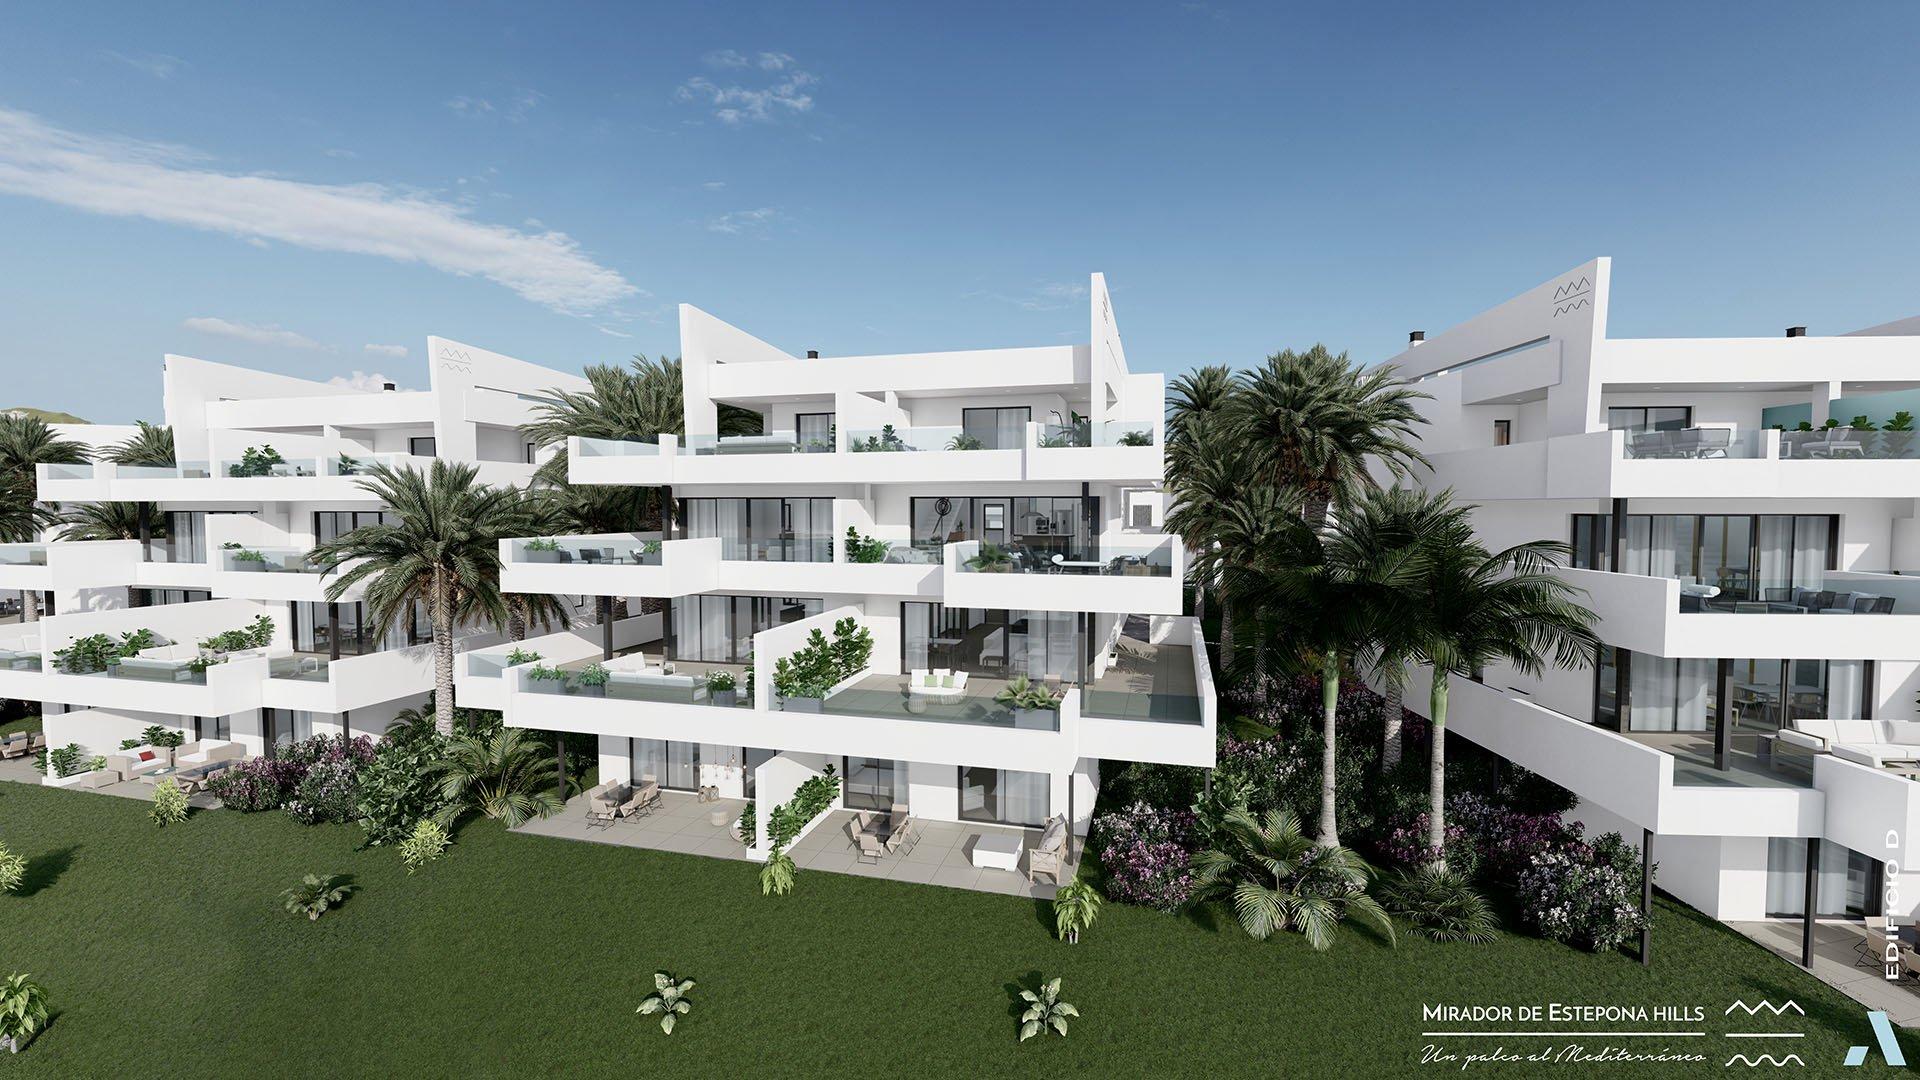 Mirador de Estepona Hills: Apartments on the outskirts of Estepona